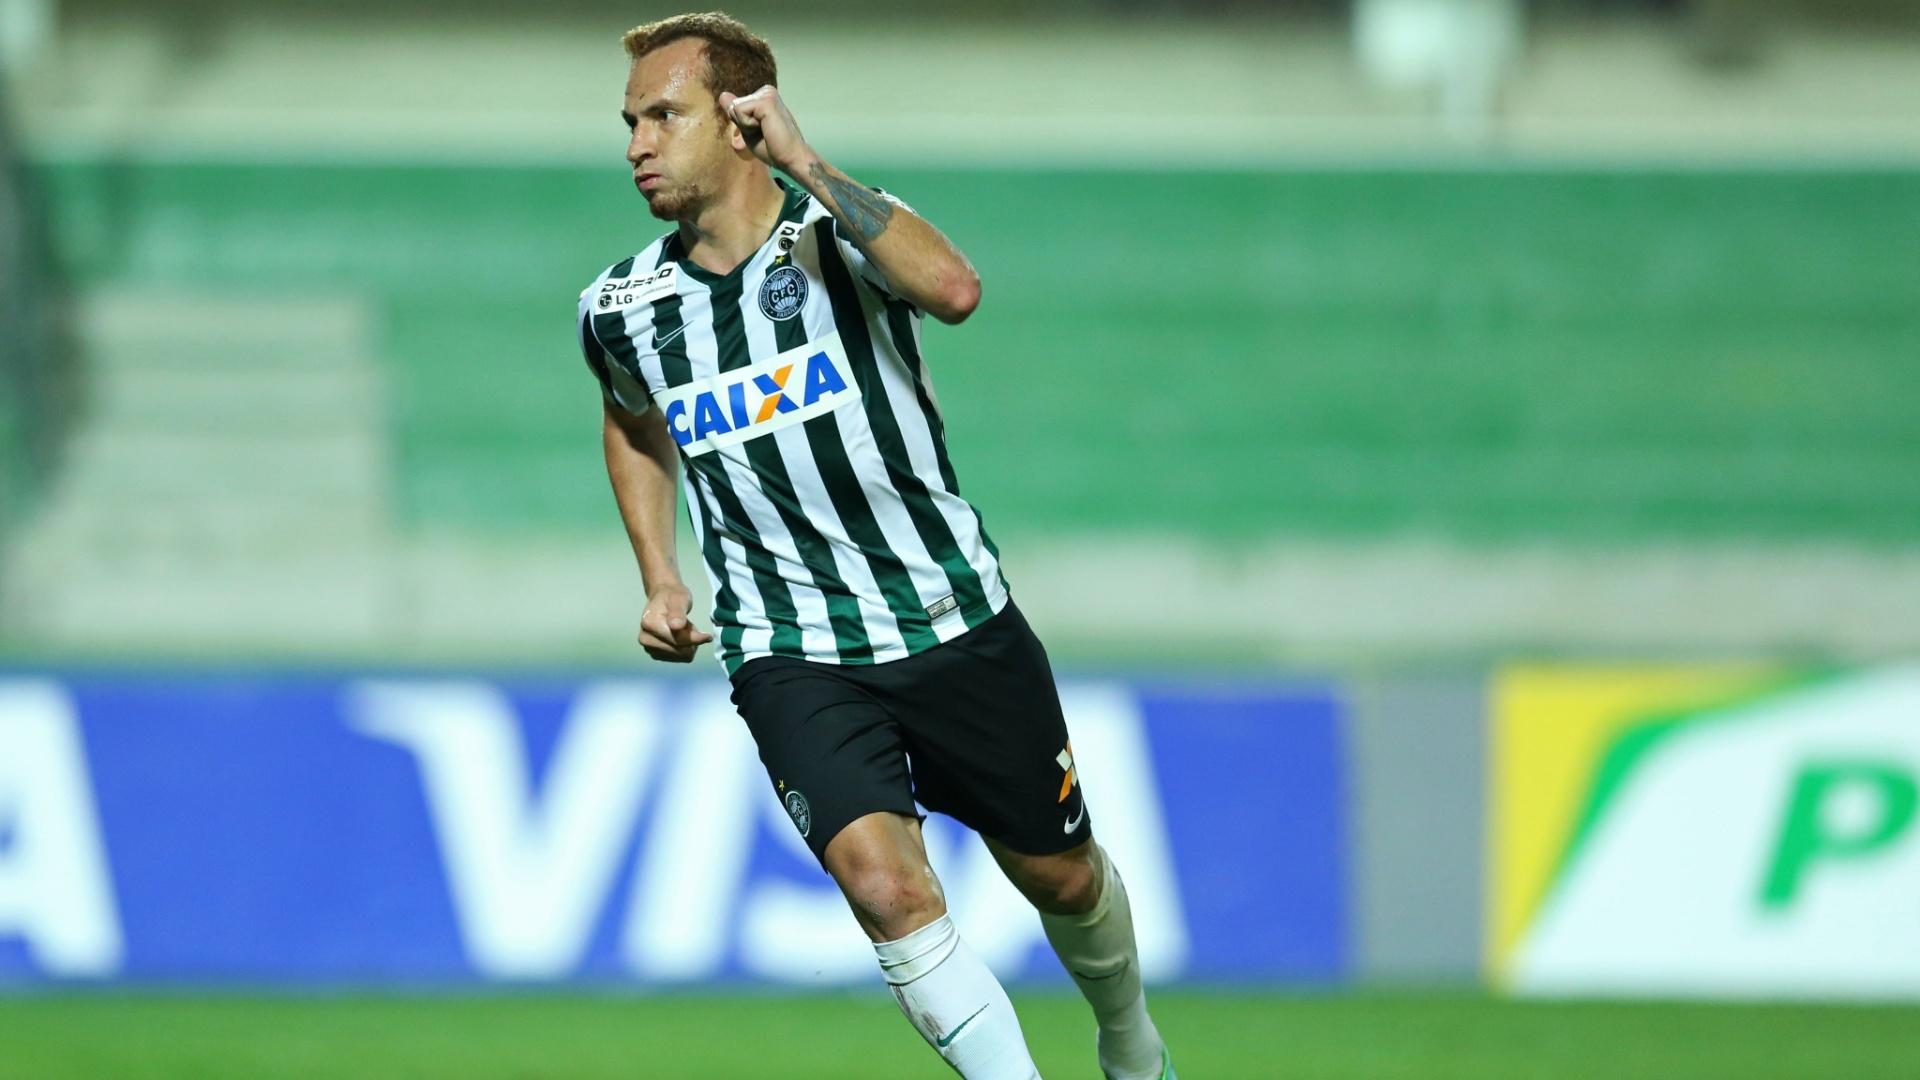 Zé Eduardo comemora após marcar o primeiro gol do Coritiba contra o Paysandu pela Copa do Brasil